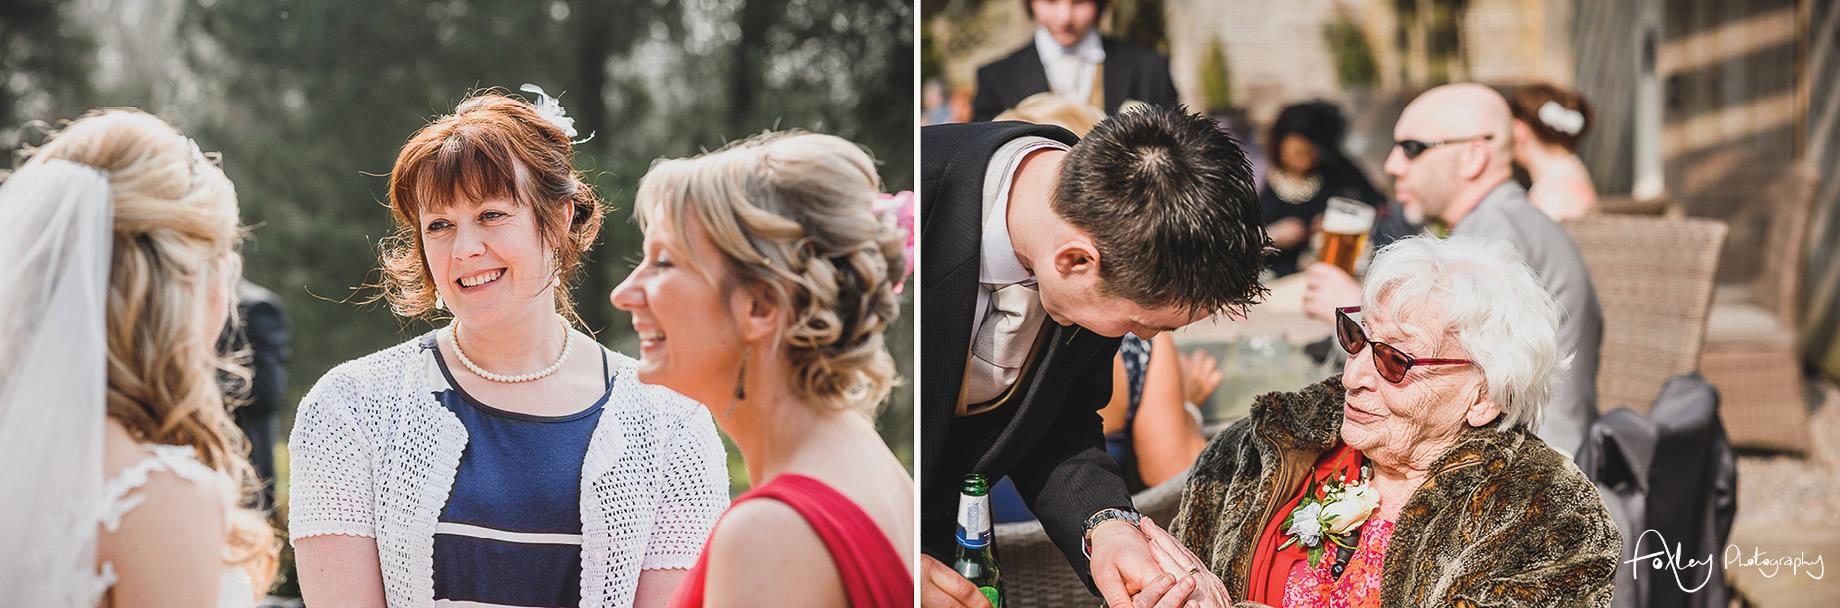 Gemma and Lewis' Wedding at Mitton Hall 106